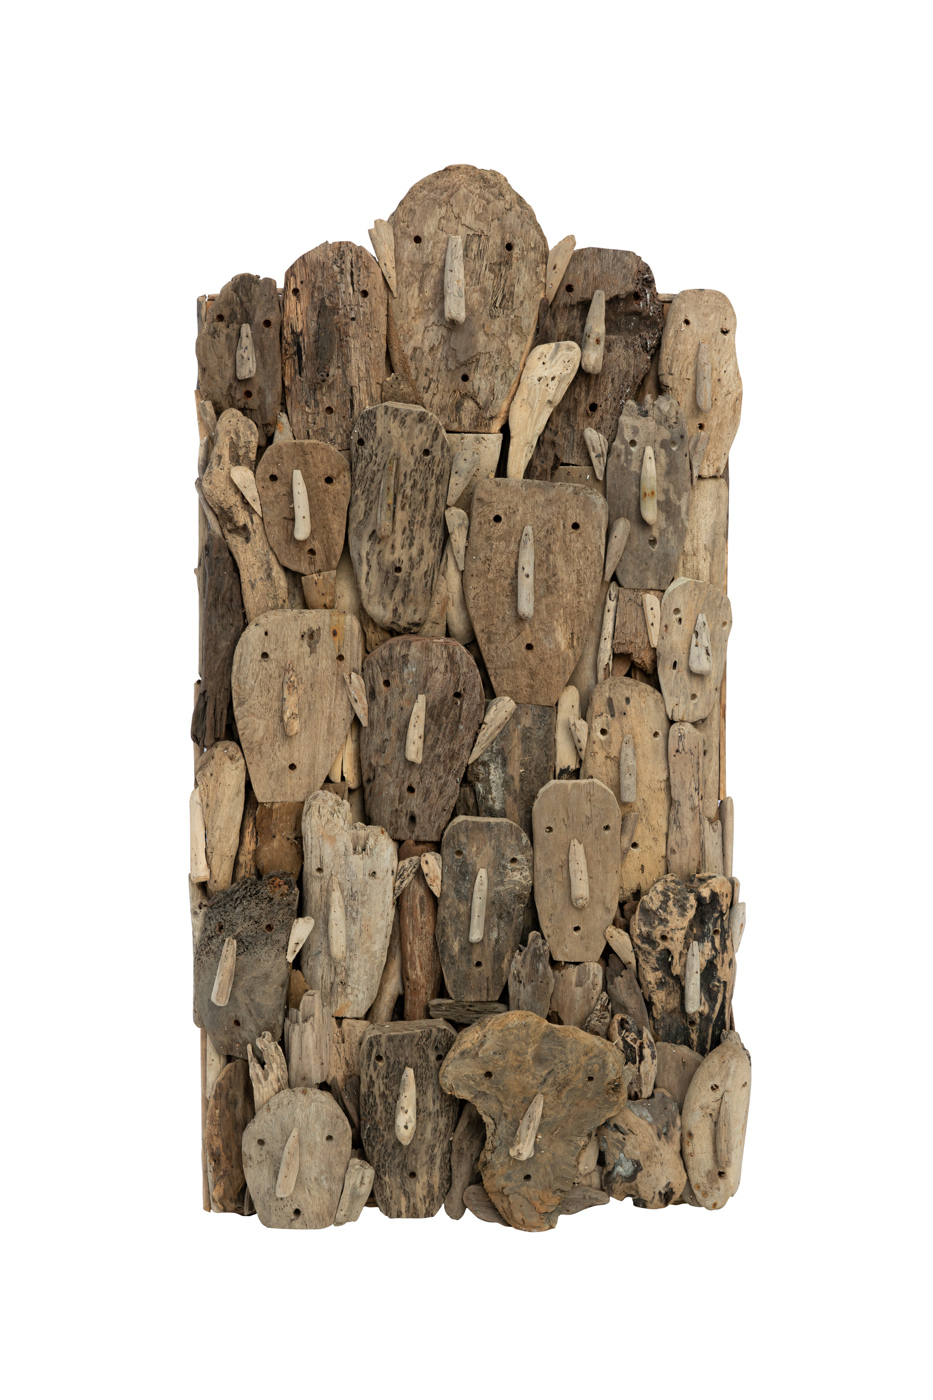 Decorative driftwood panel